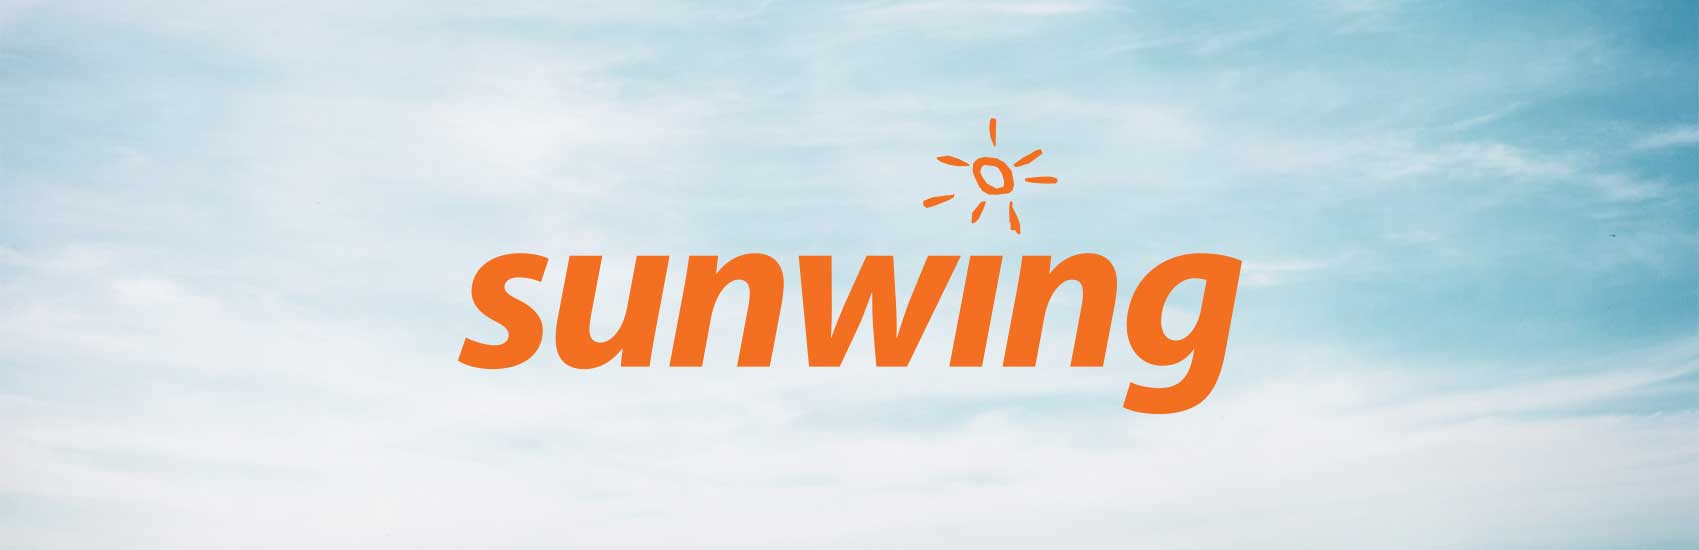 Sunwing Page EBB 0